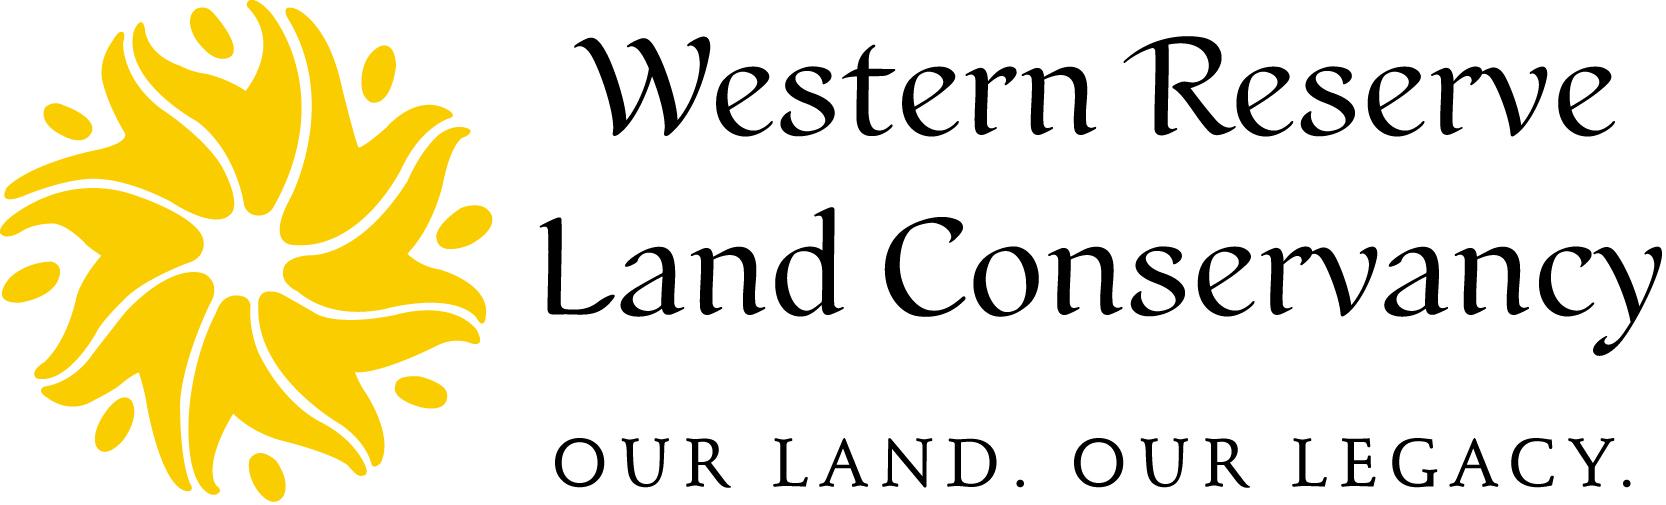 Western Reserve Land Conservancy Logo